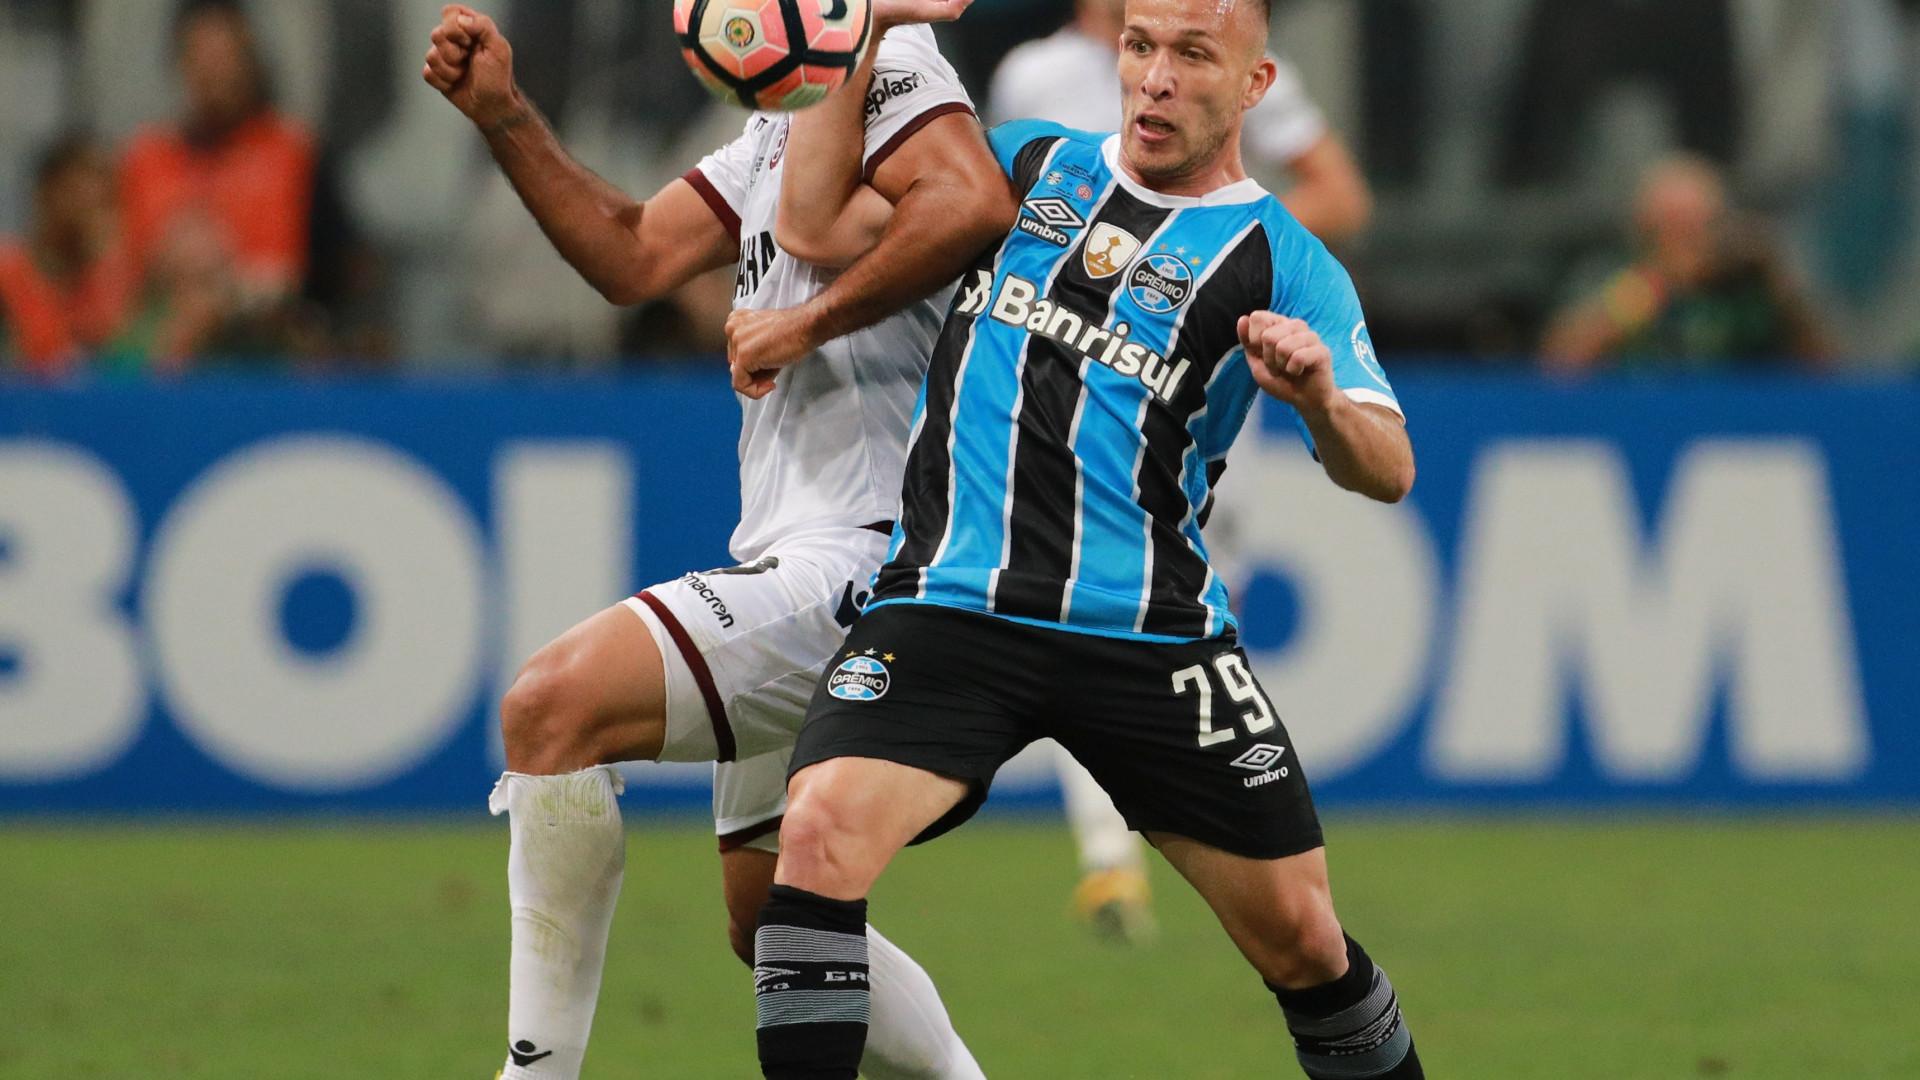 Fechado: Grémio acerta transferência de Arthur para o Barcelona